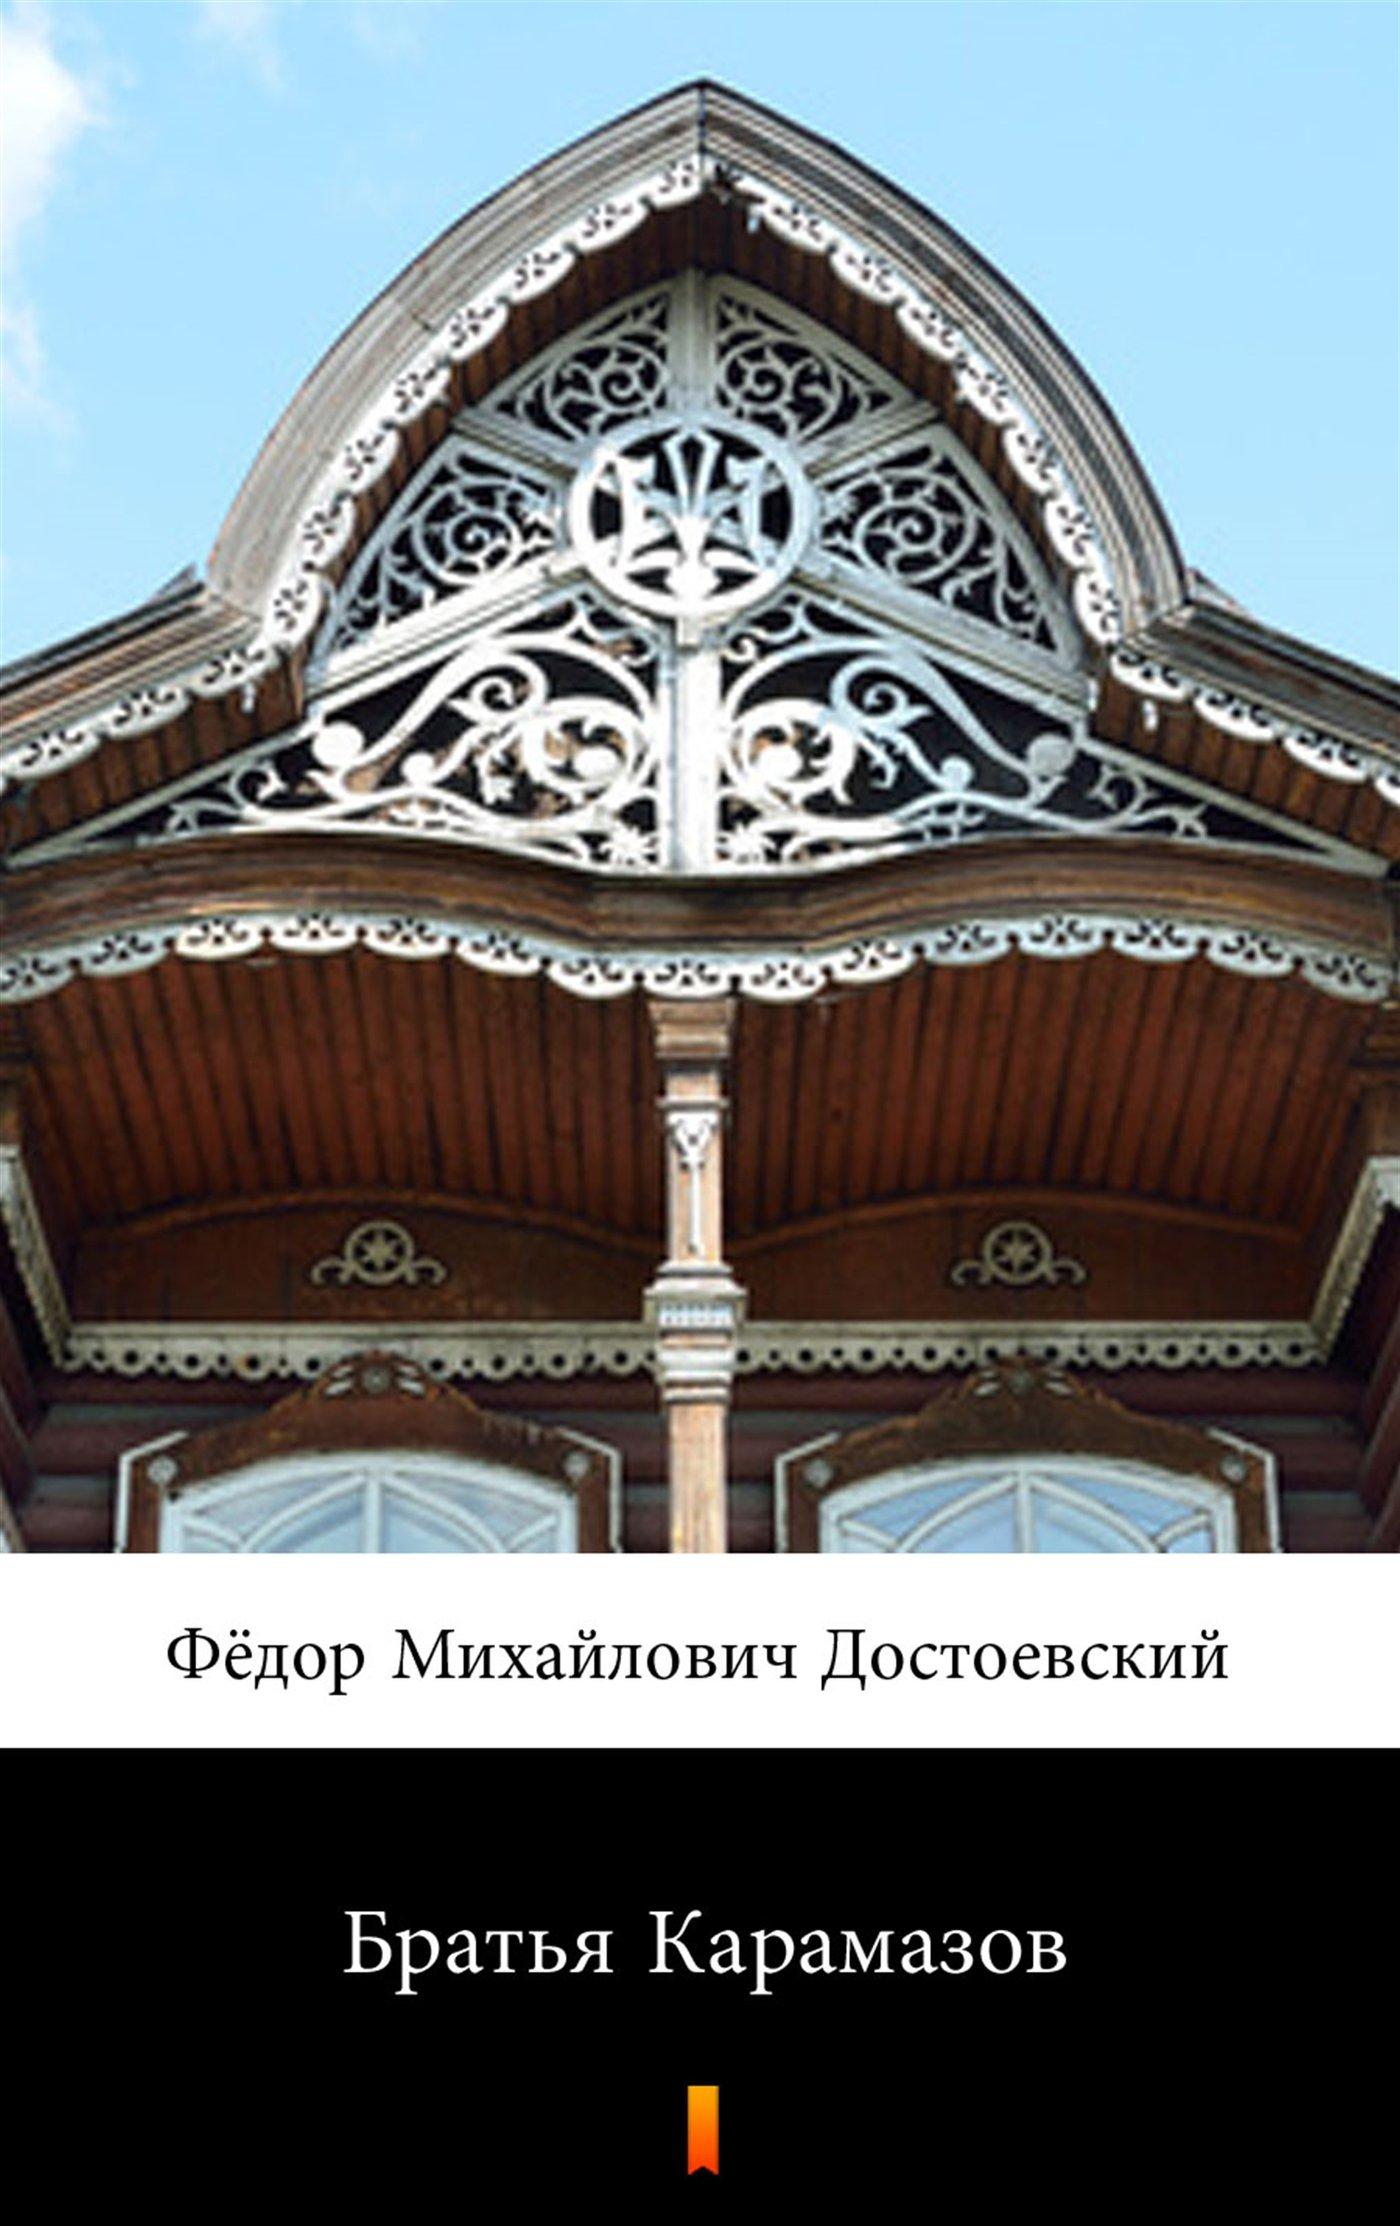 Братья Карамазов - Ebook (Książka EPUB) do pobrania w formacie EPUB